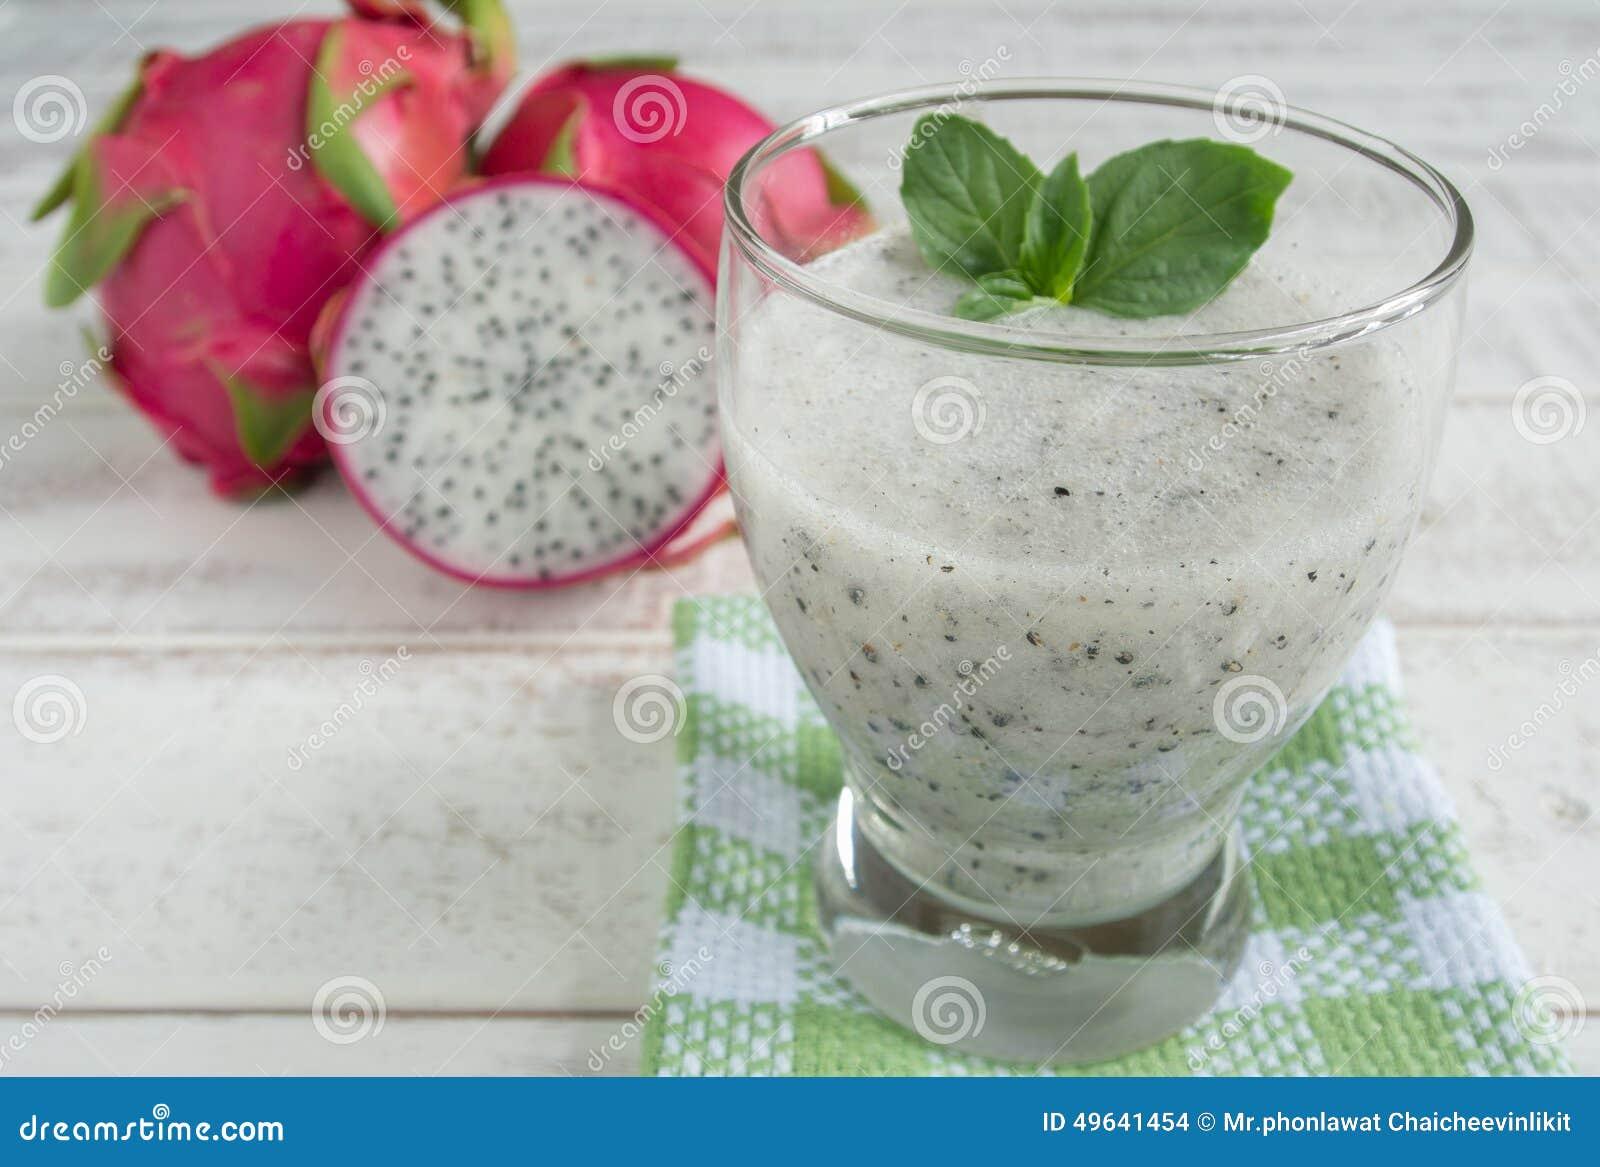 Natural Organic Health Drinks